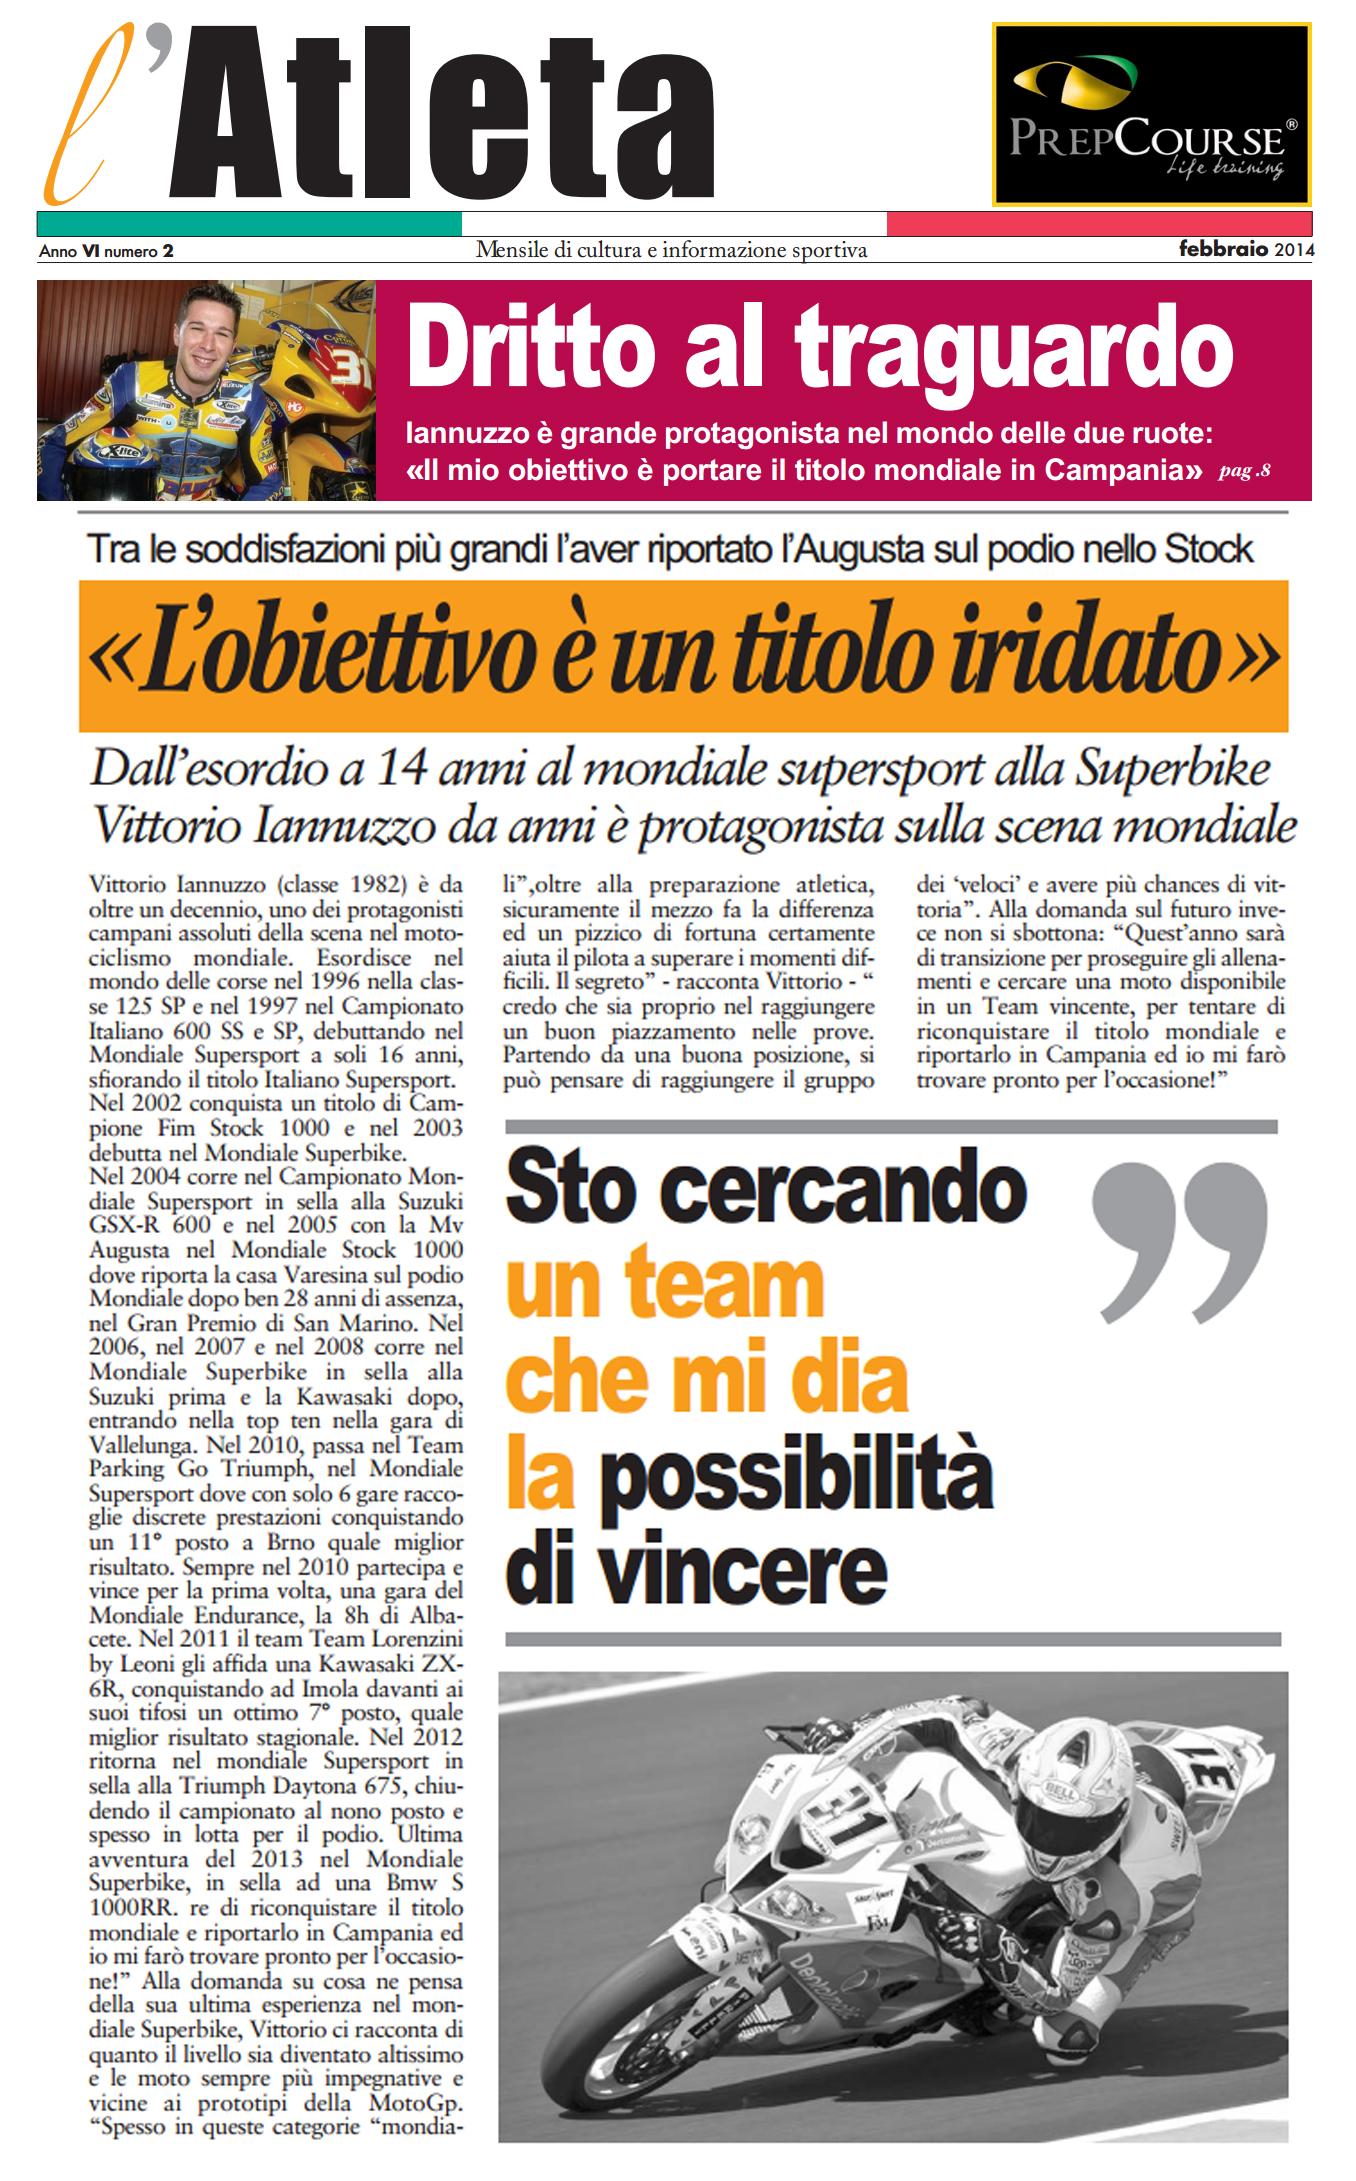 Vittorio_Iannuzzo_Superbike_2014_Intervista_l_atleta_Ian_31